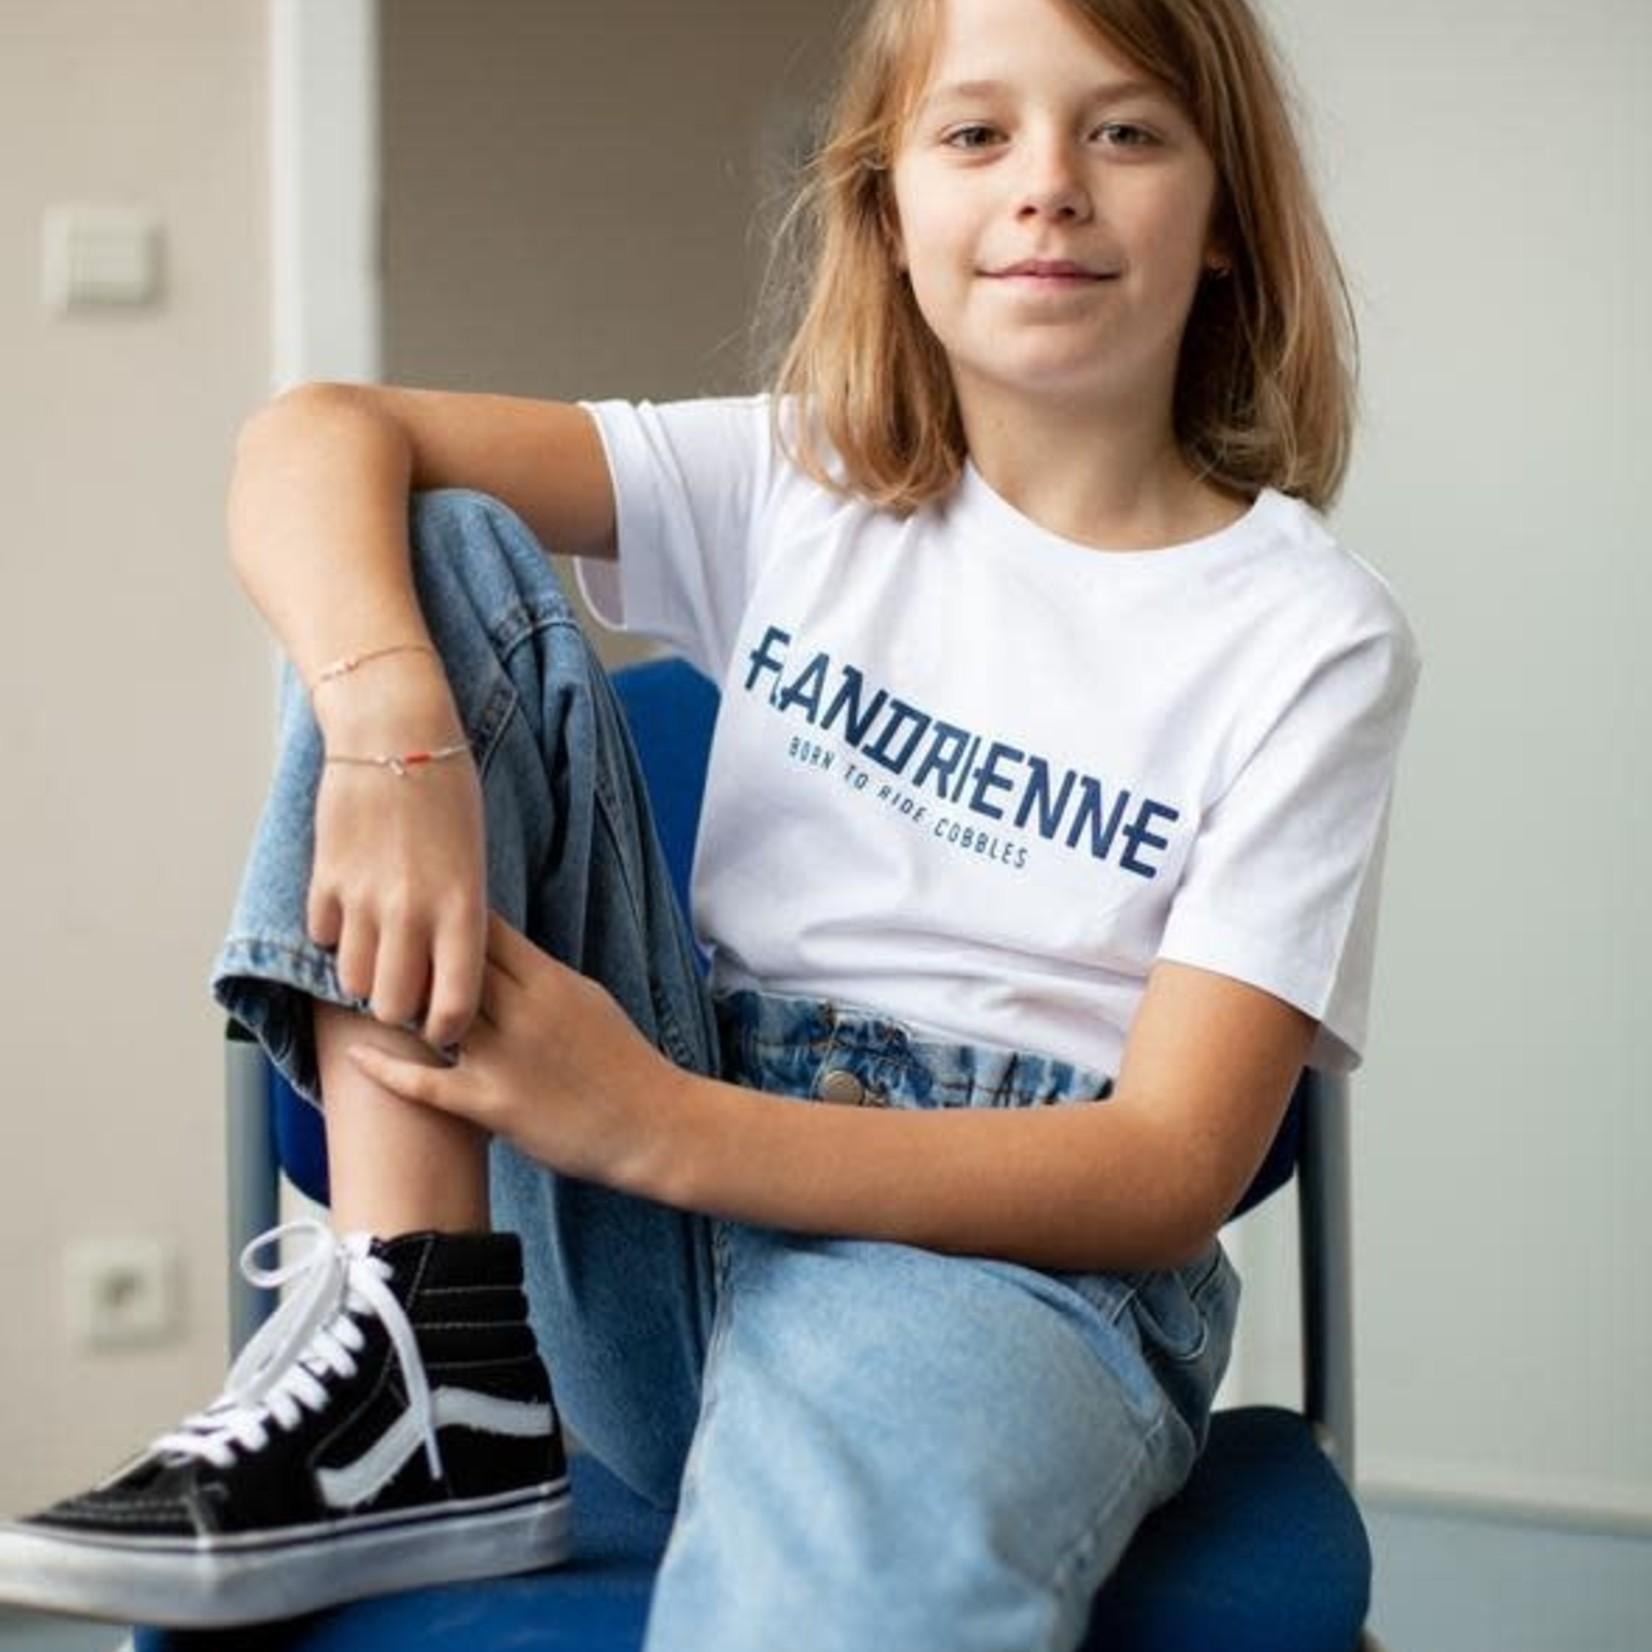 T-shirt kids 'Flandrienne'